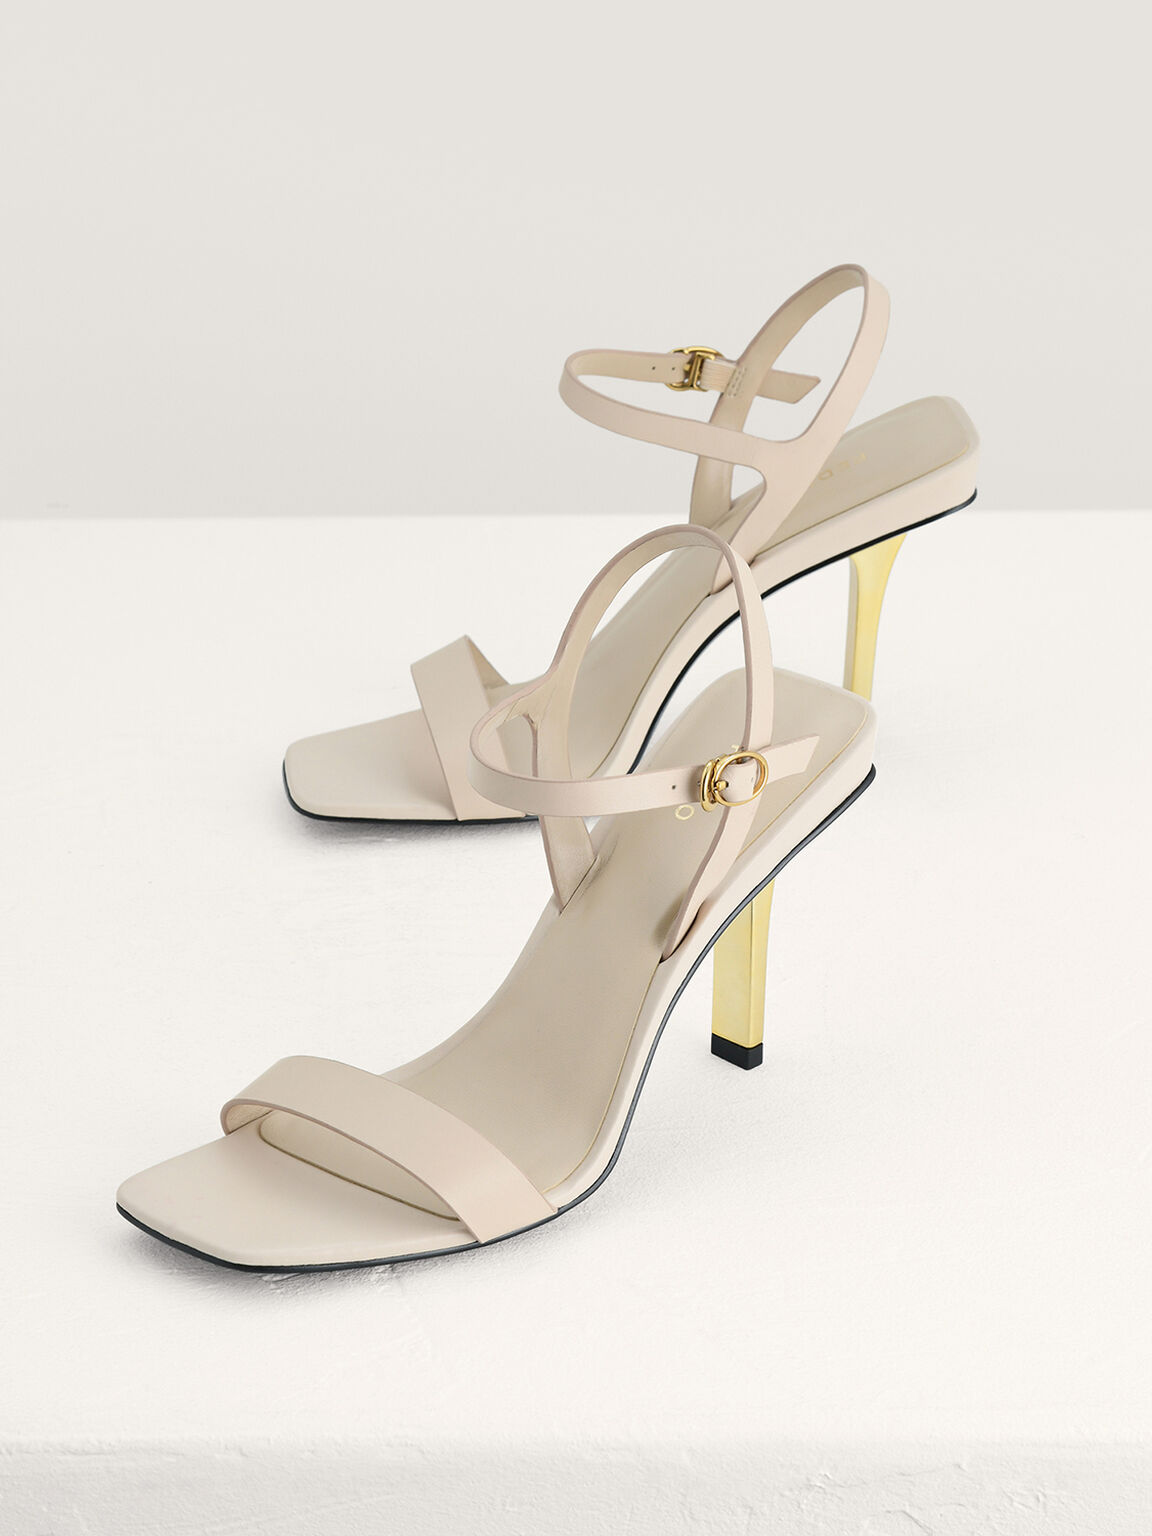 Leather High Heel Sandals, Cream, hi-res